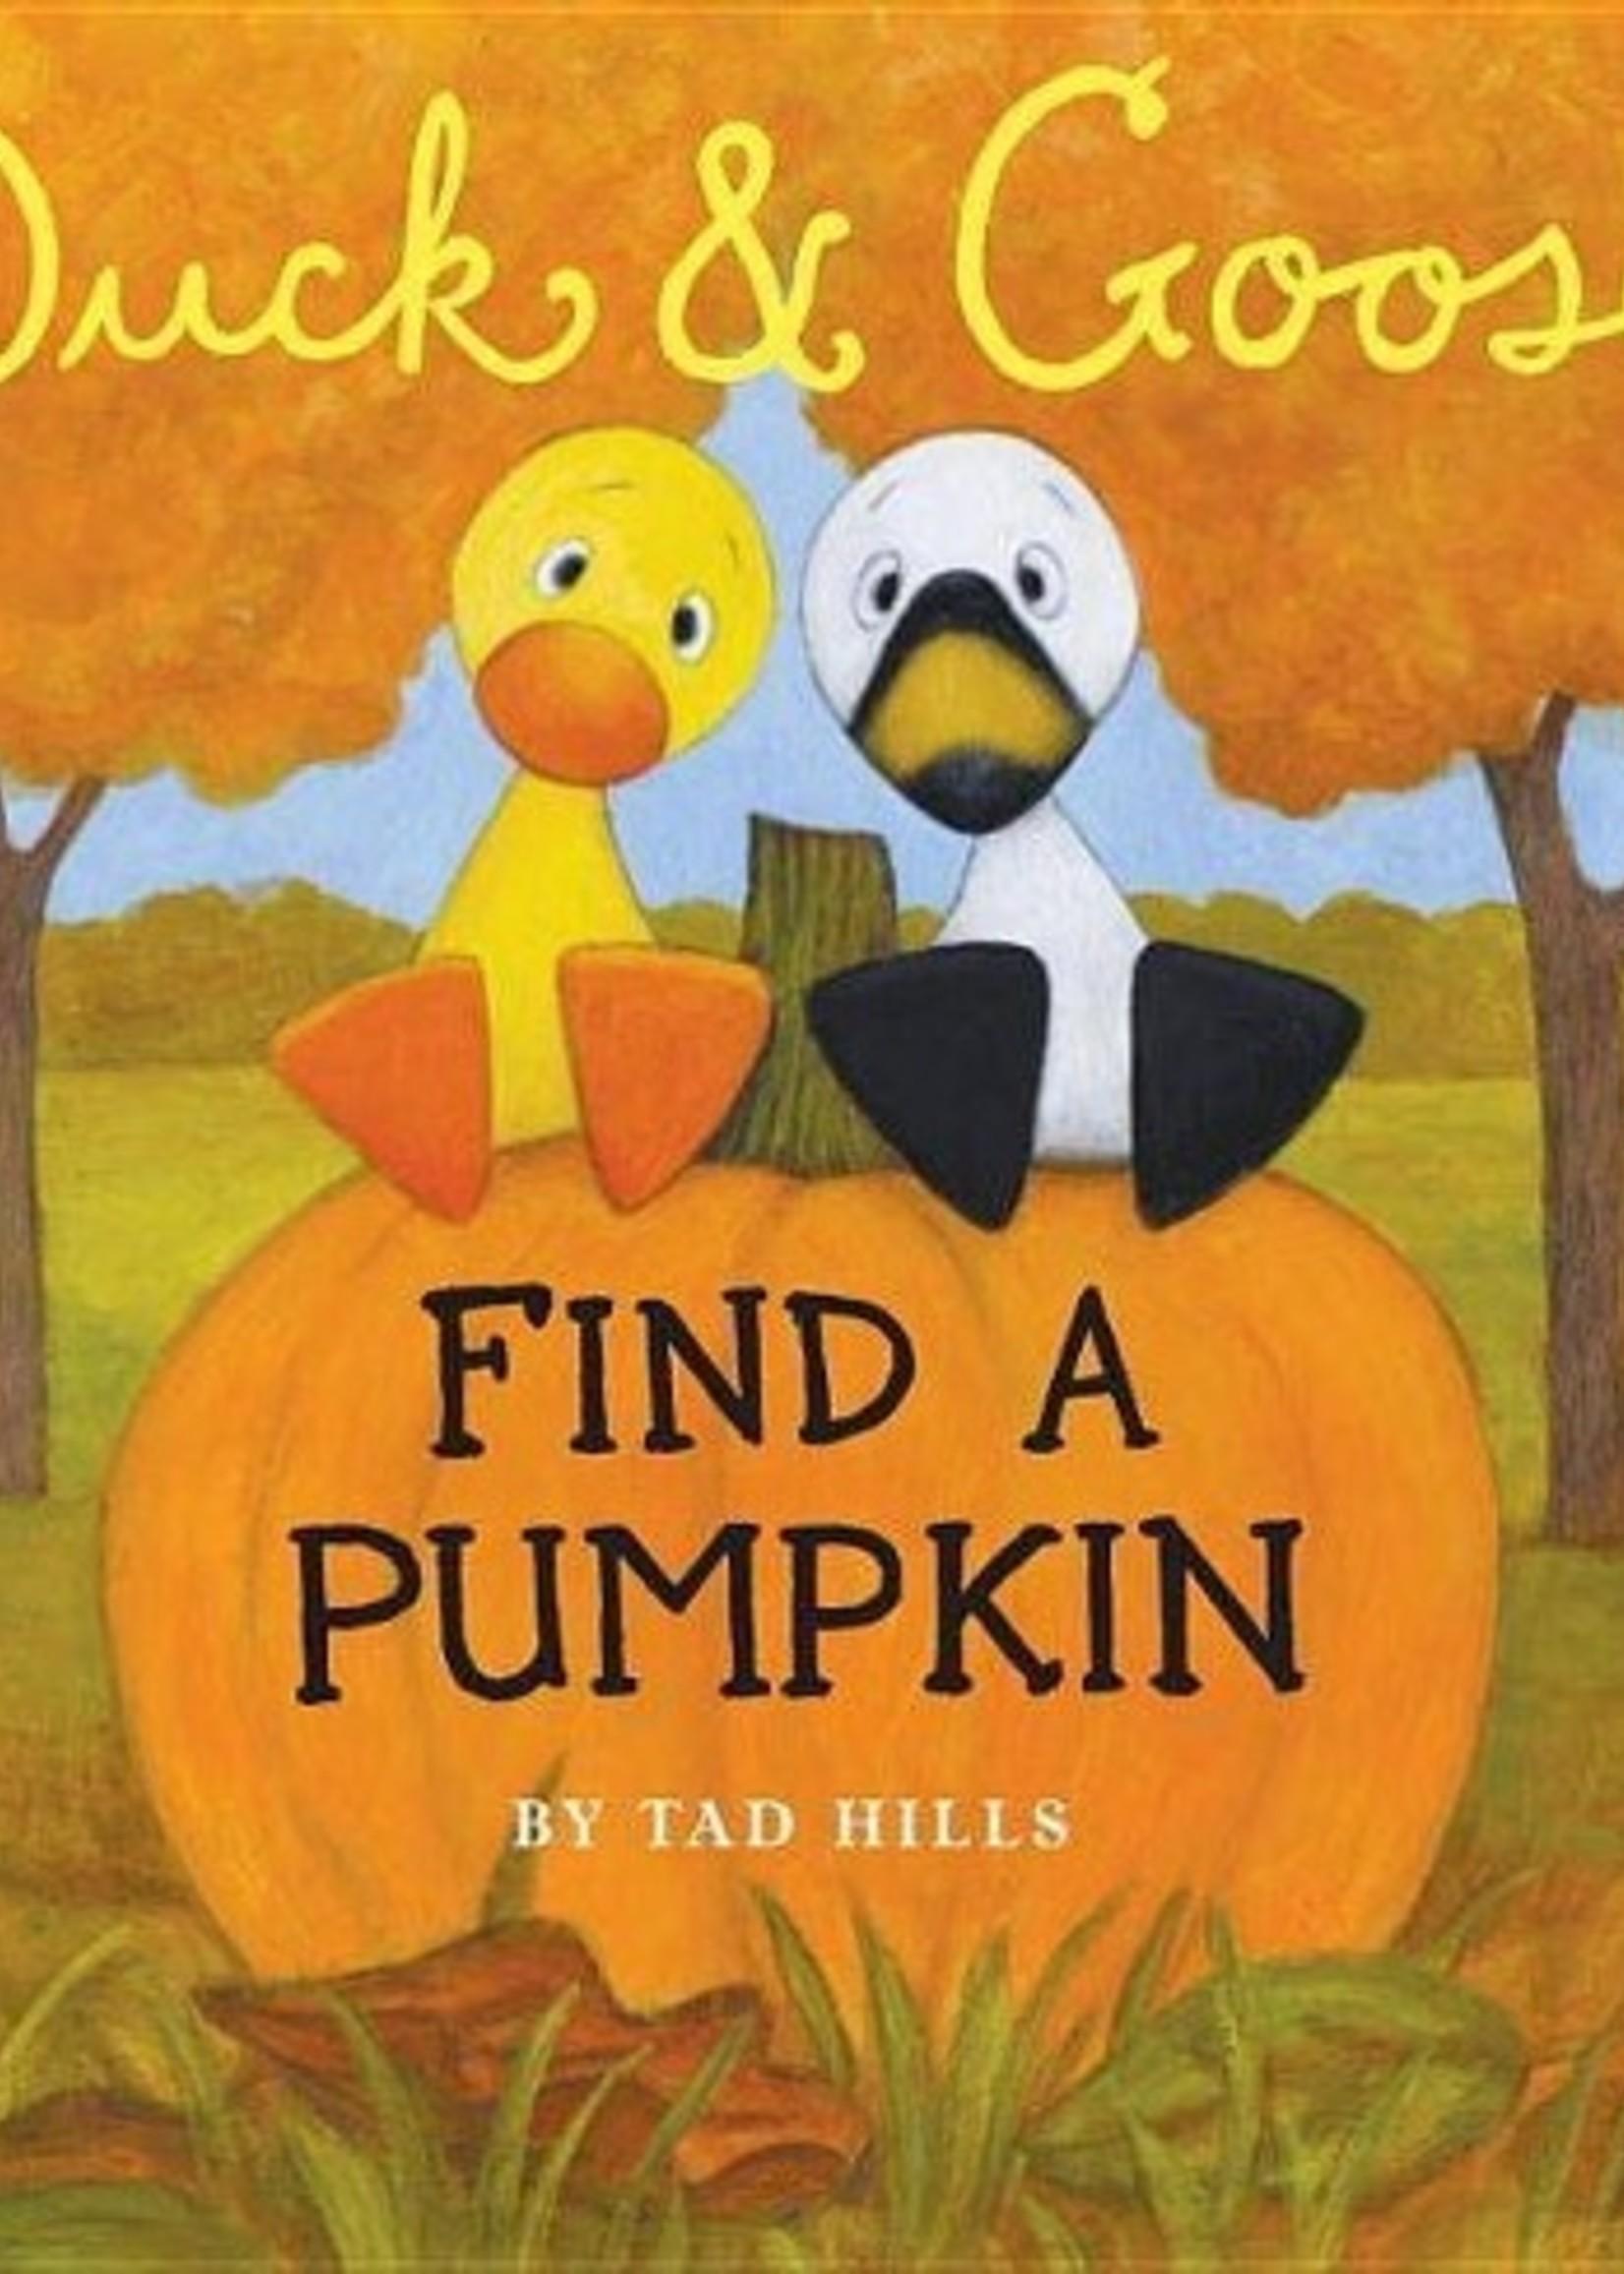 Duck and Goose Find a Pumpkin - Board Book